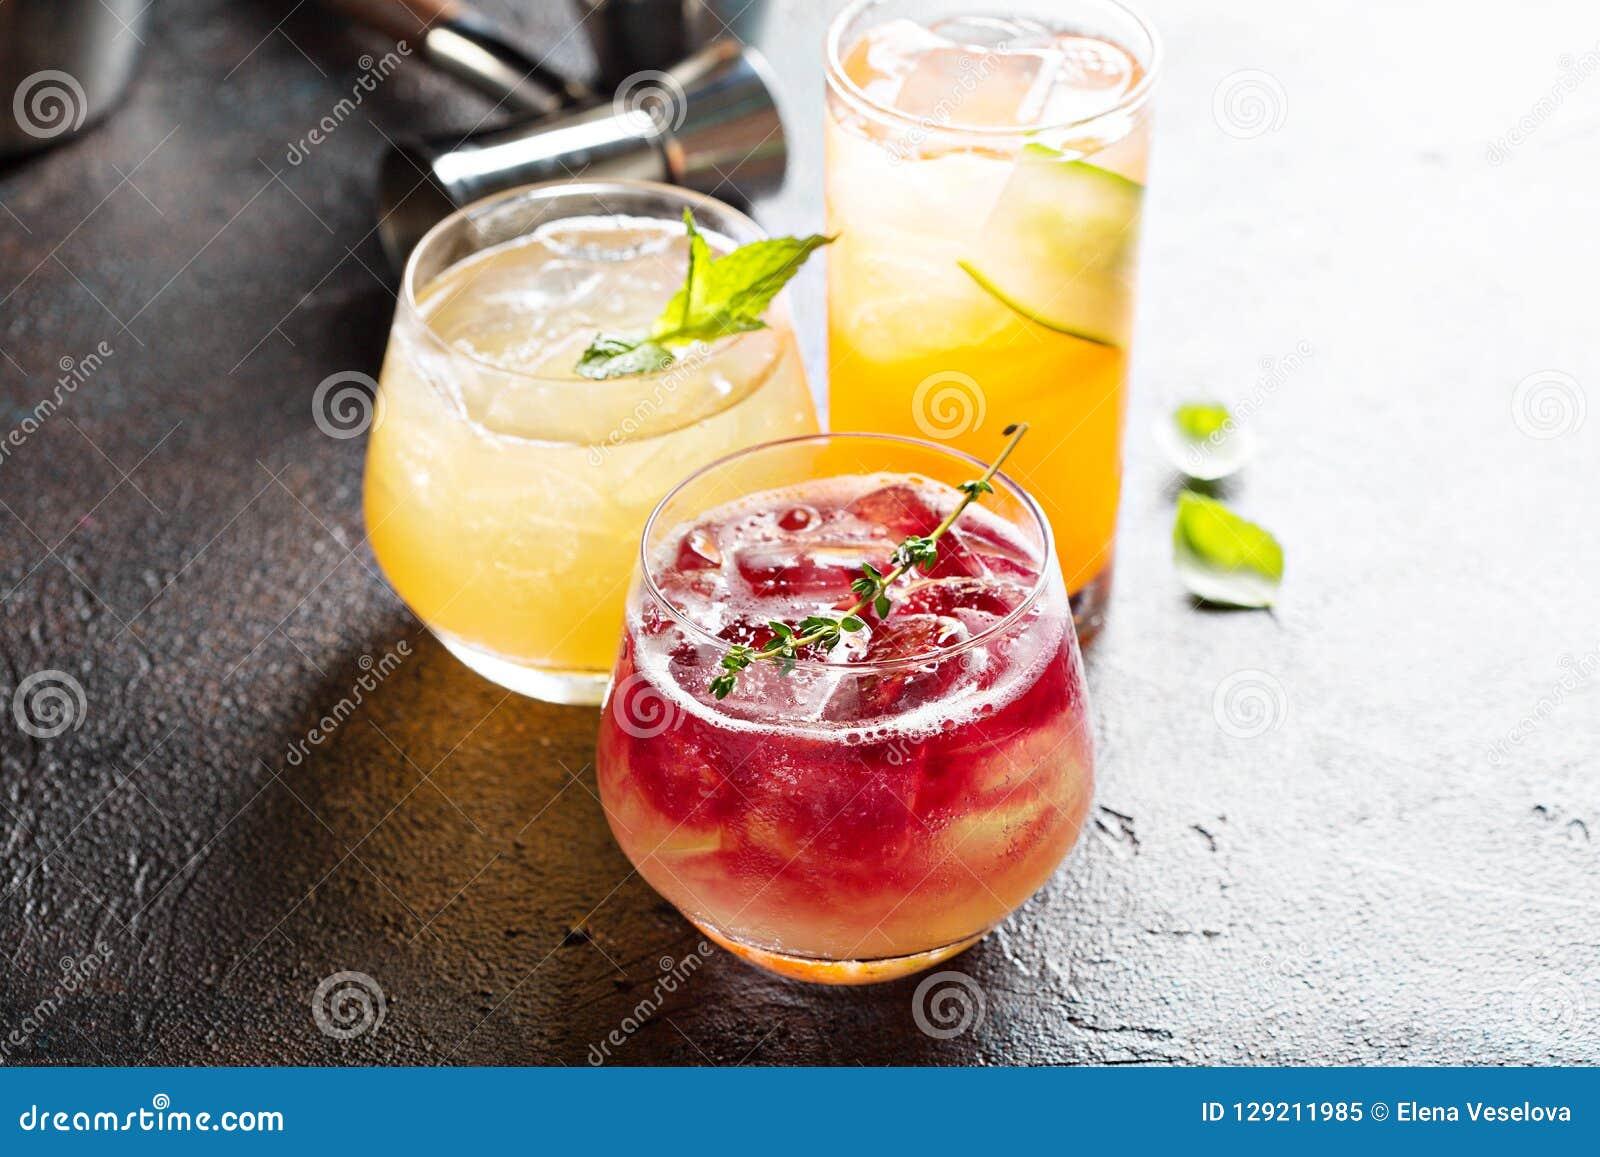 Variety of seasonal cocktails